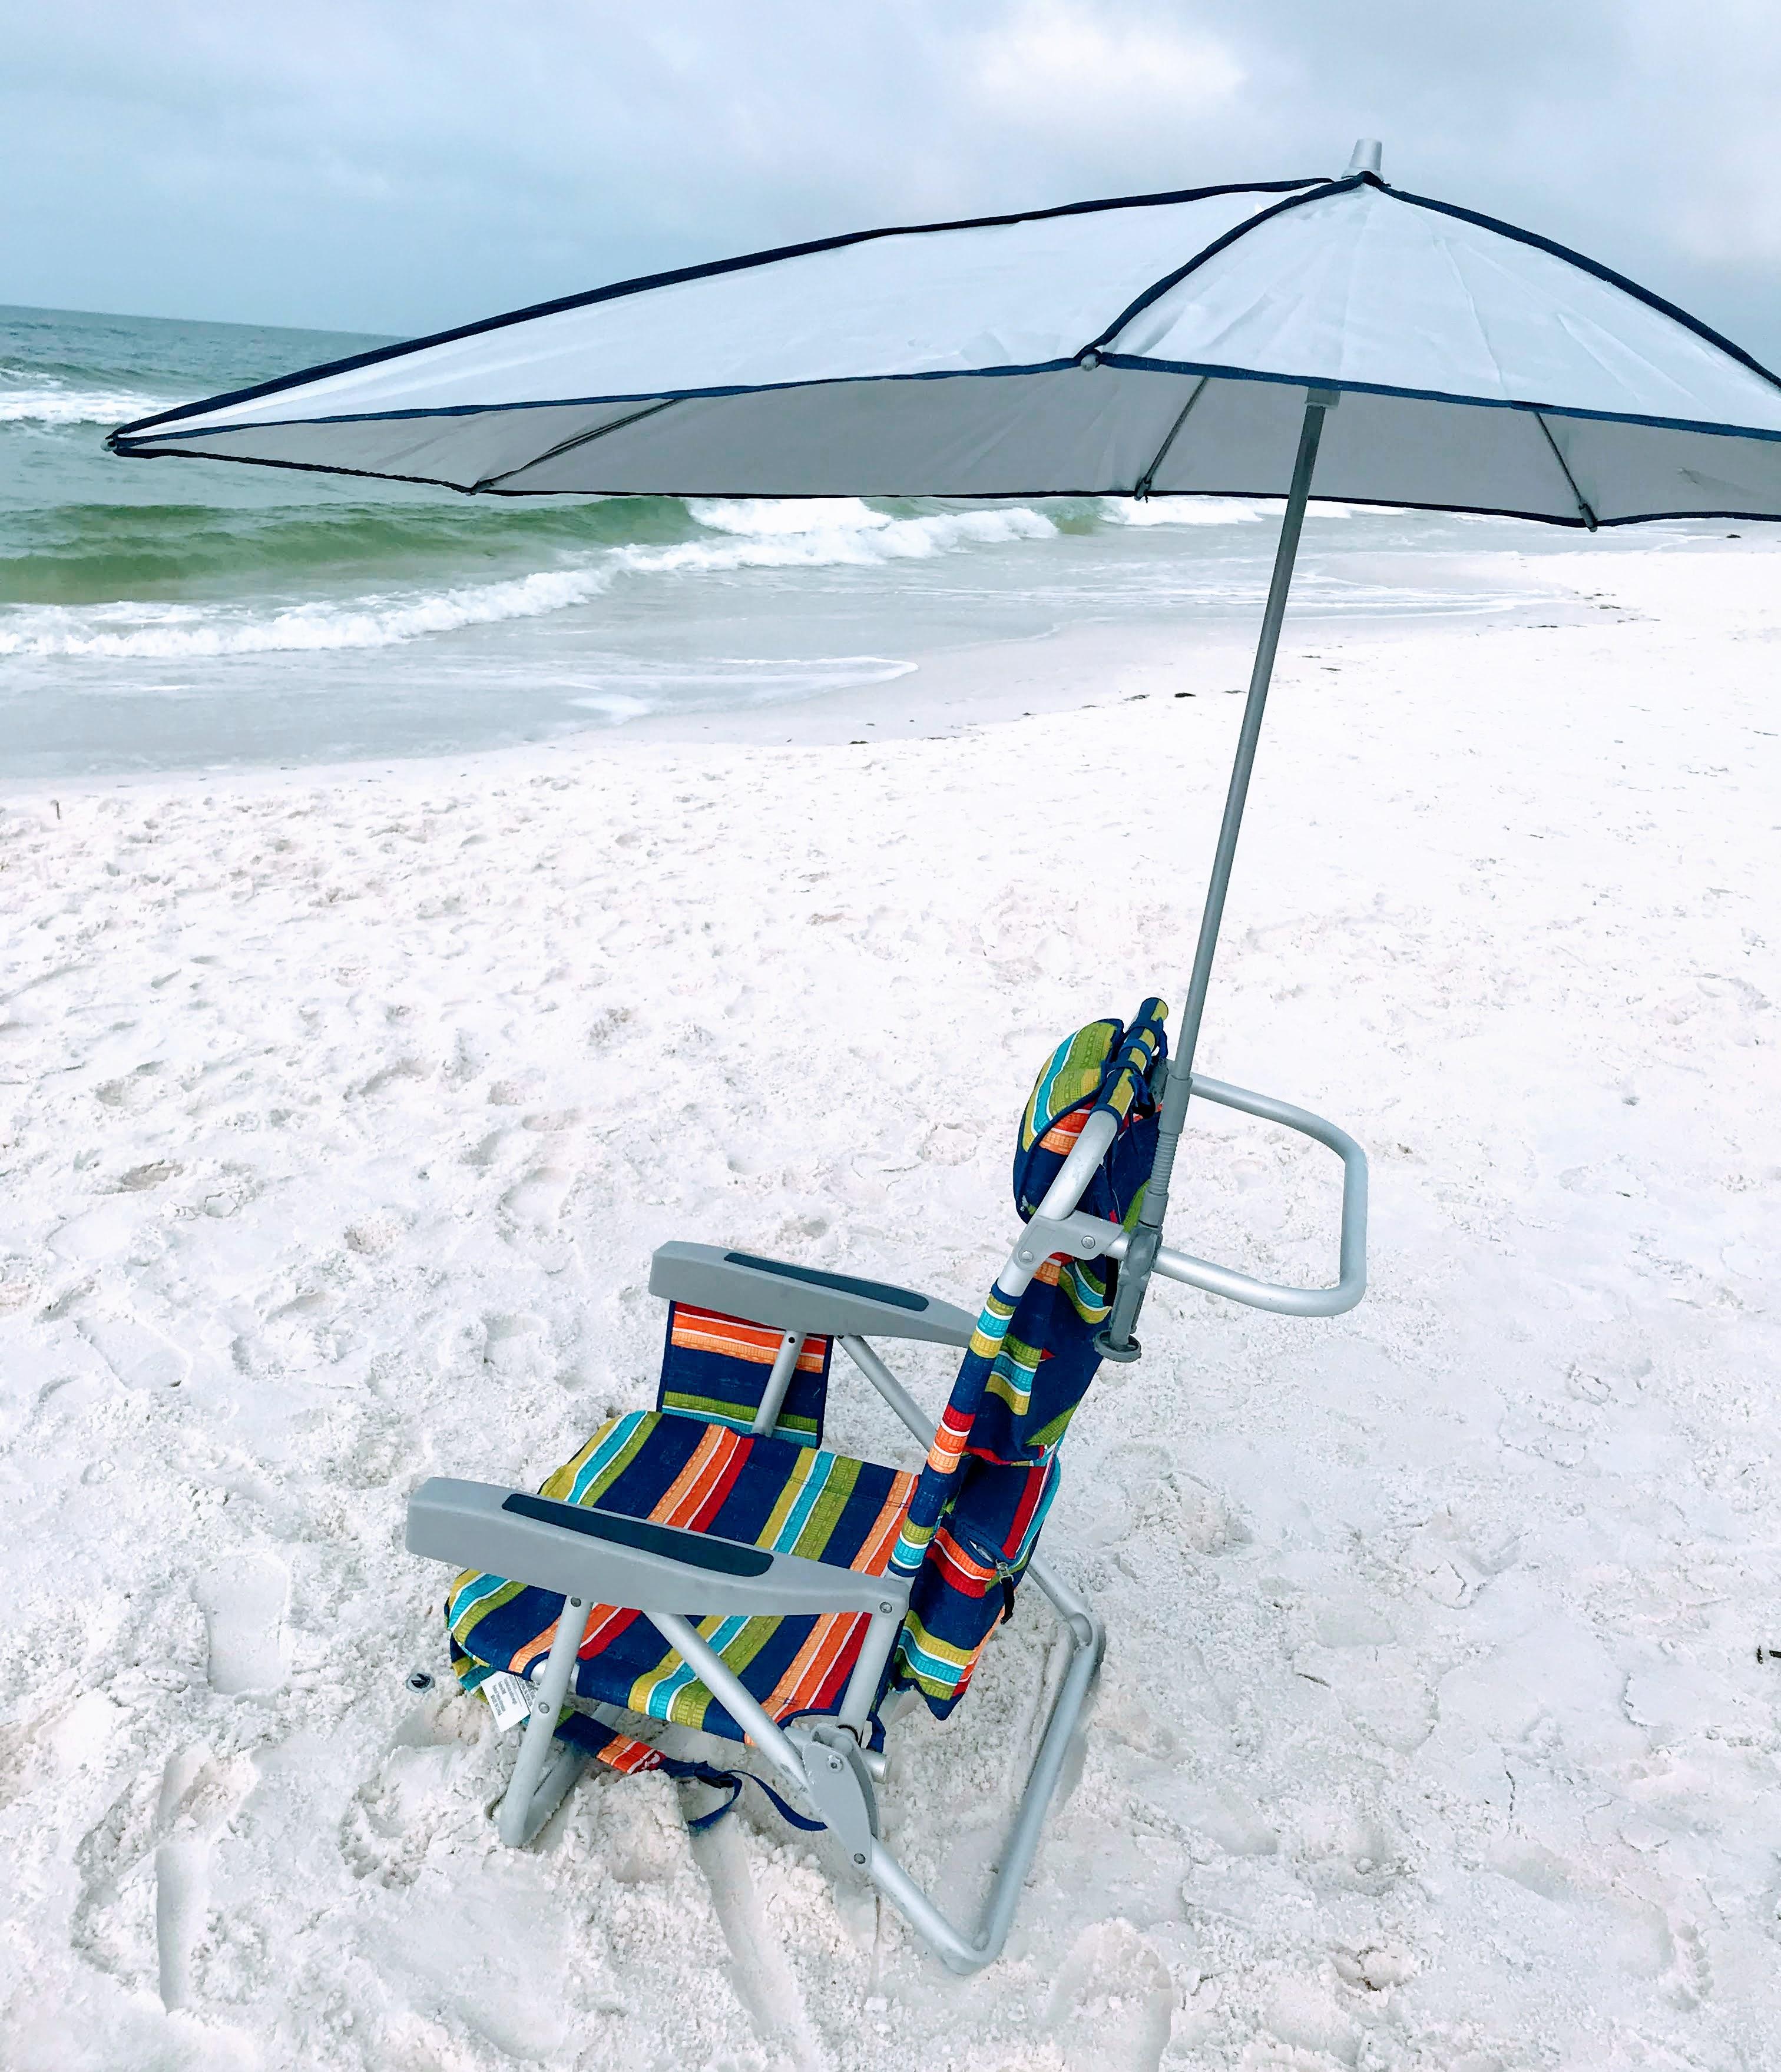 beach chair with canopy shade